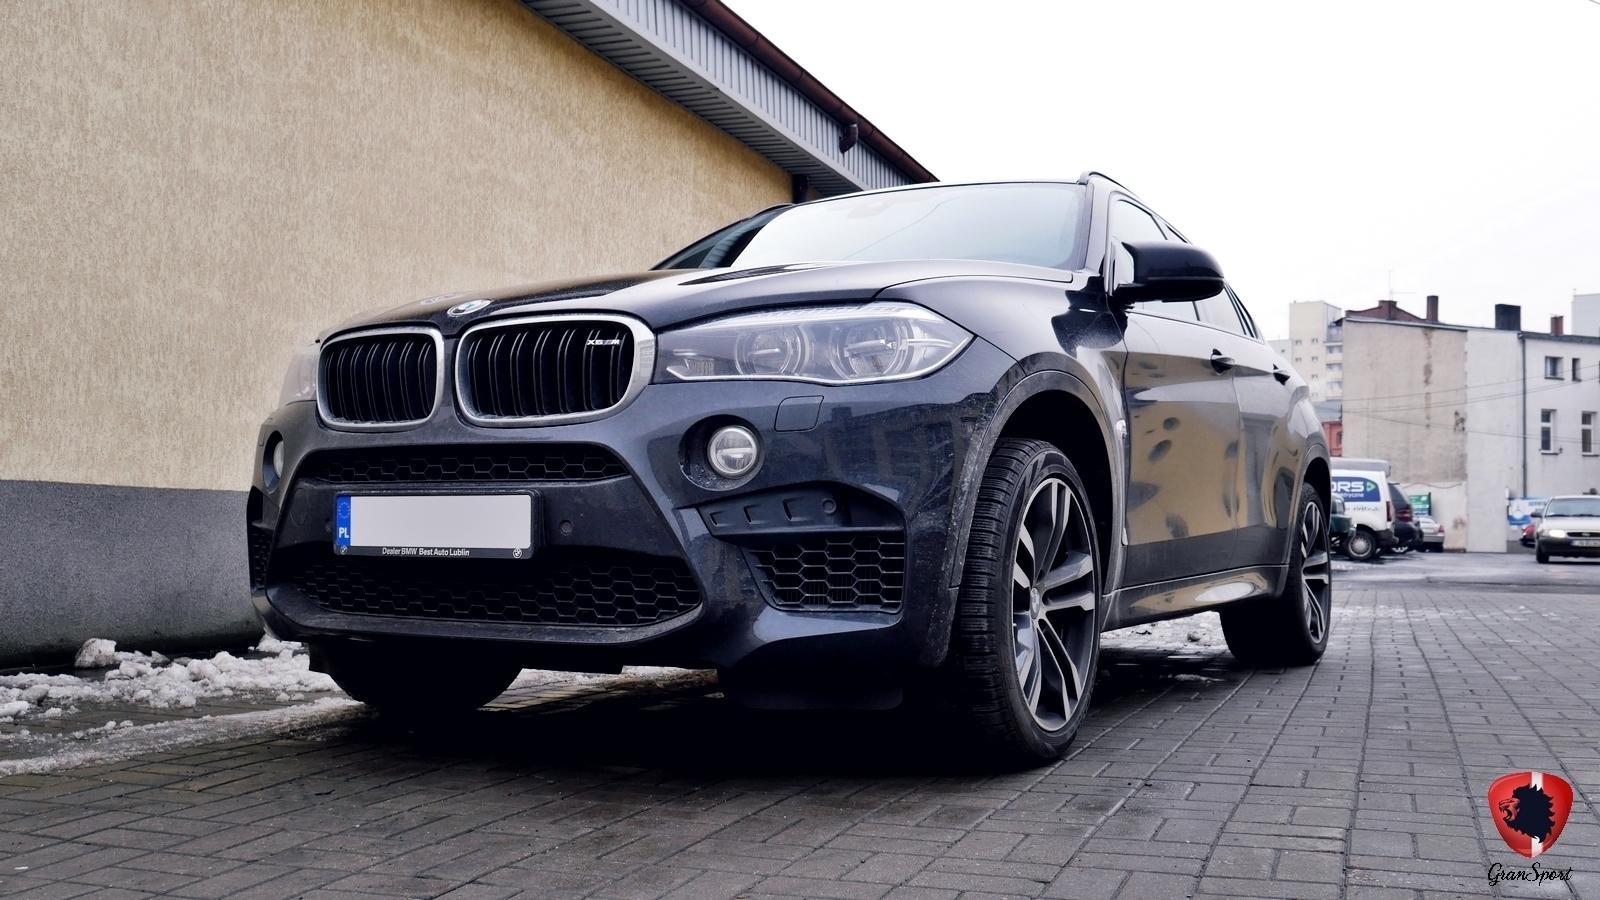 bmw-x6-f16-maxhaust